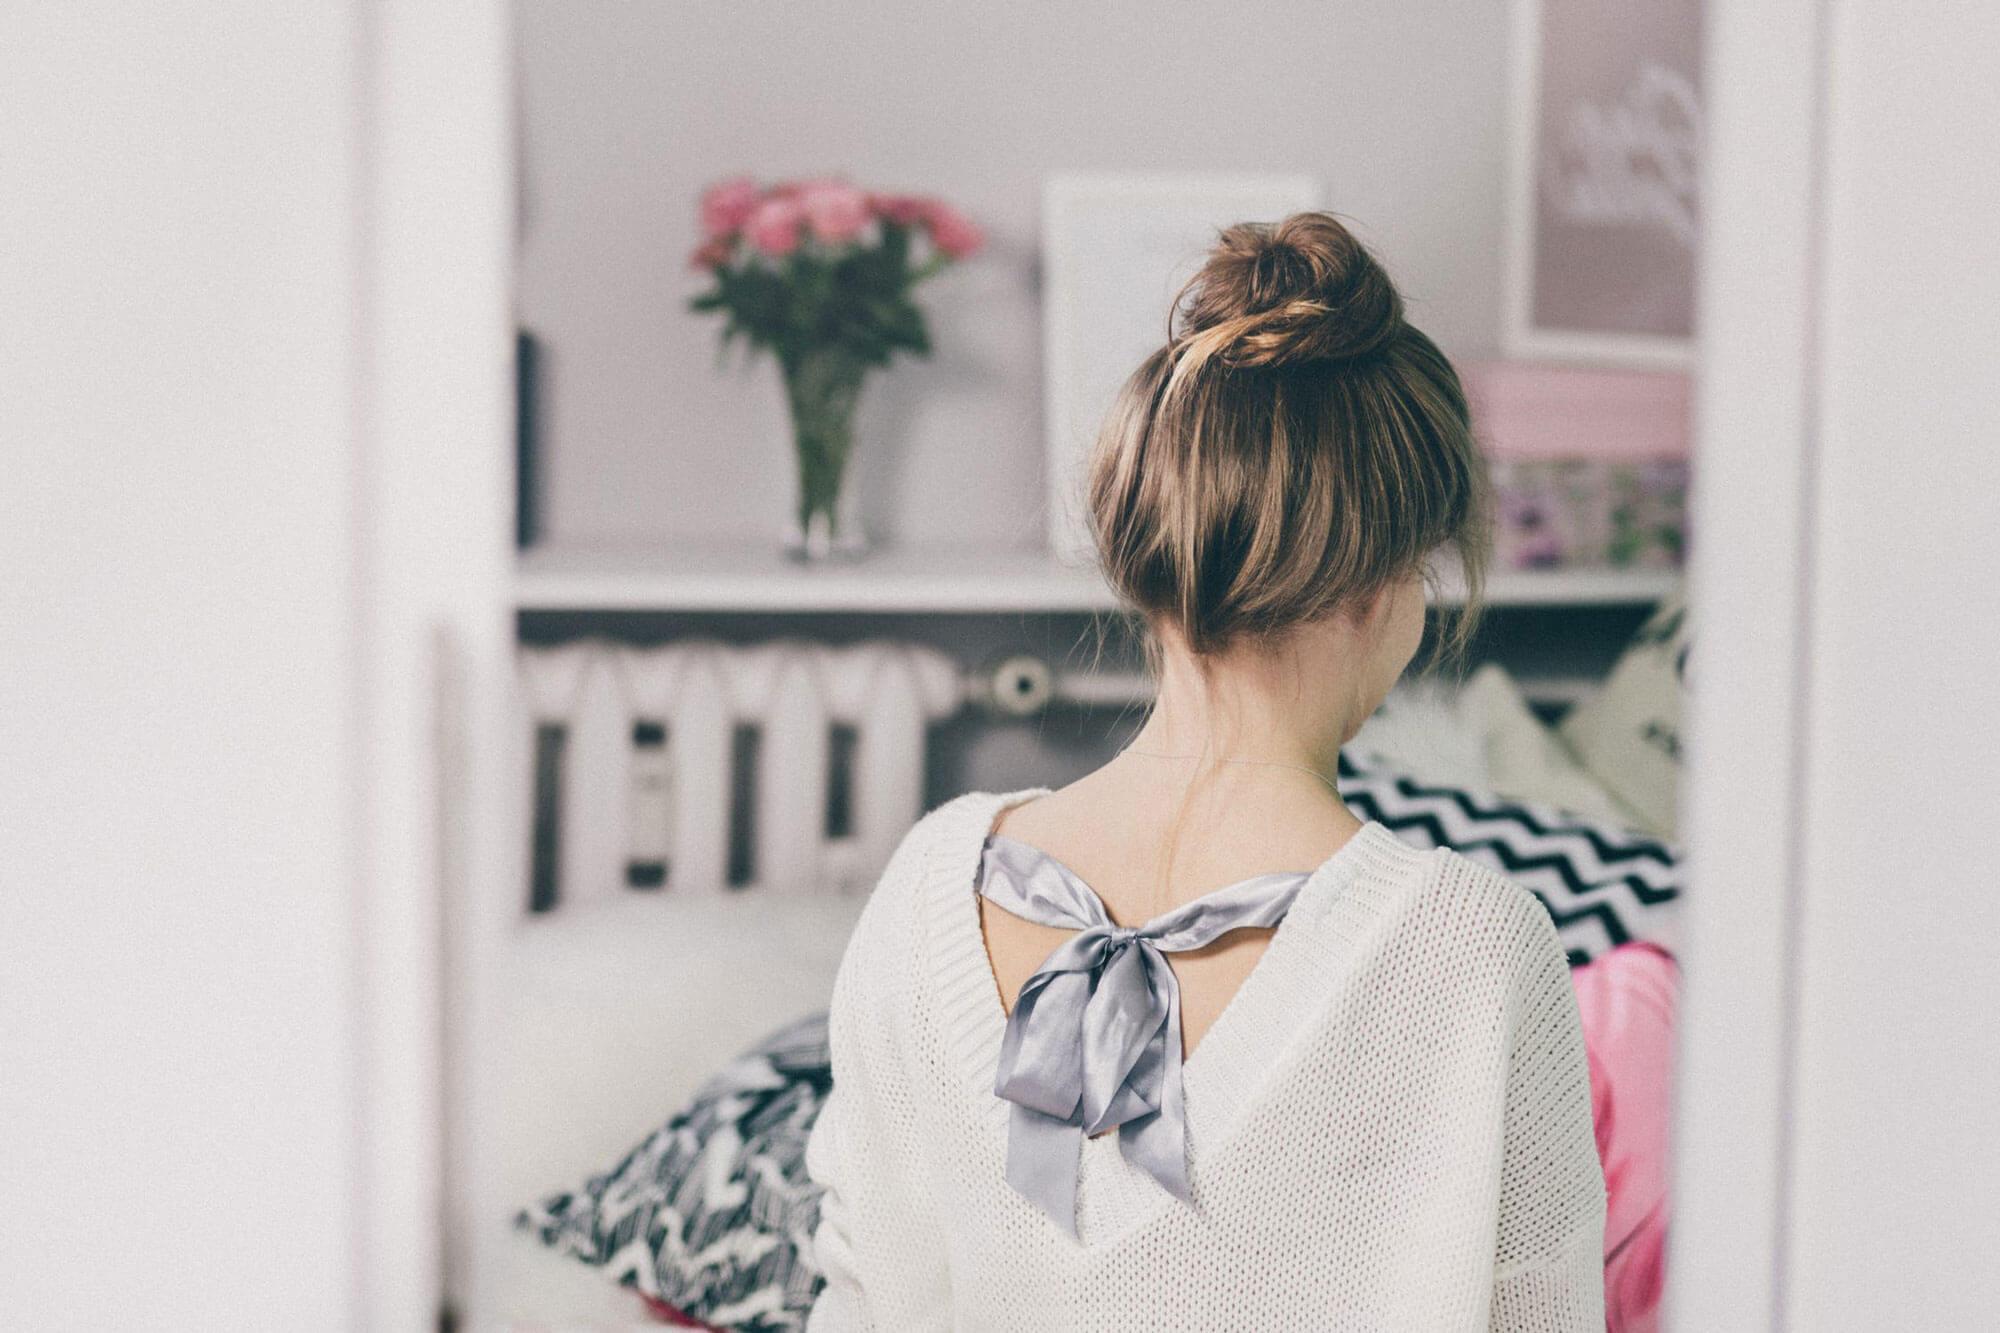 Mittellange Haare Trendfrisur